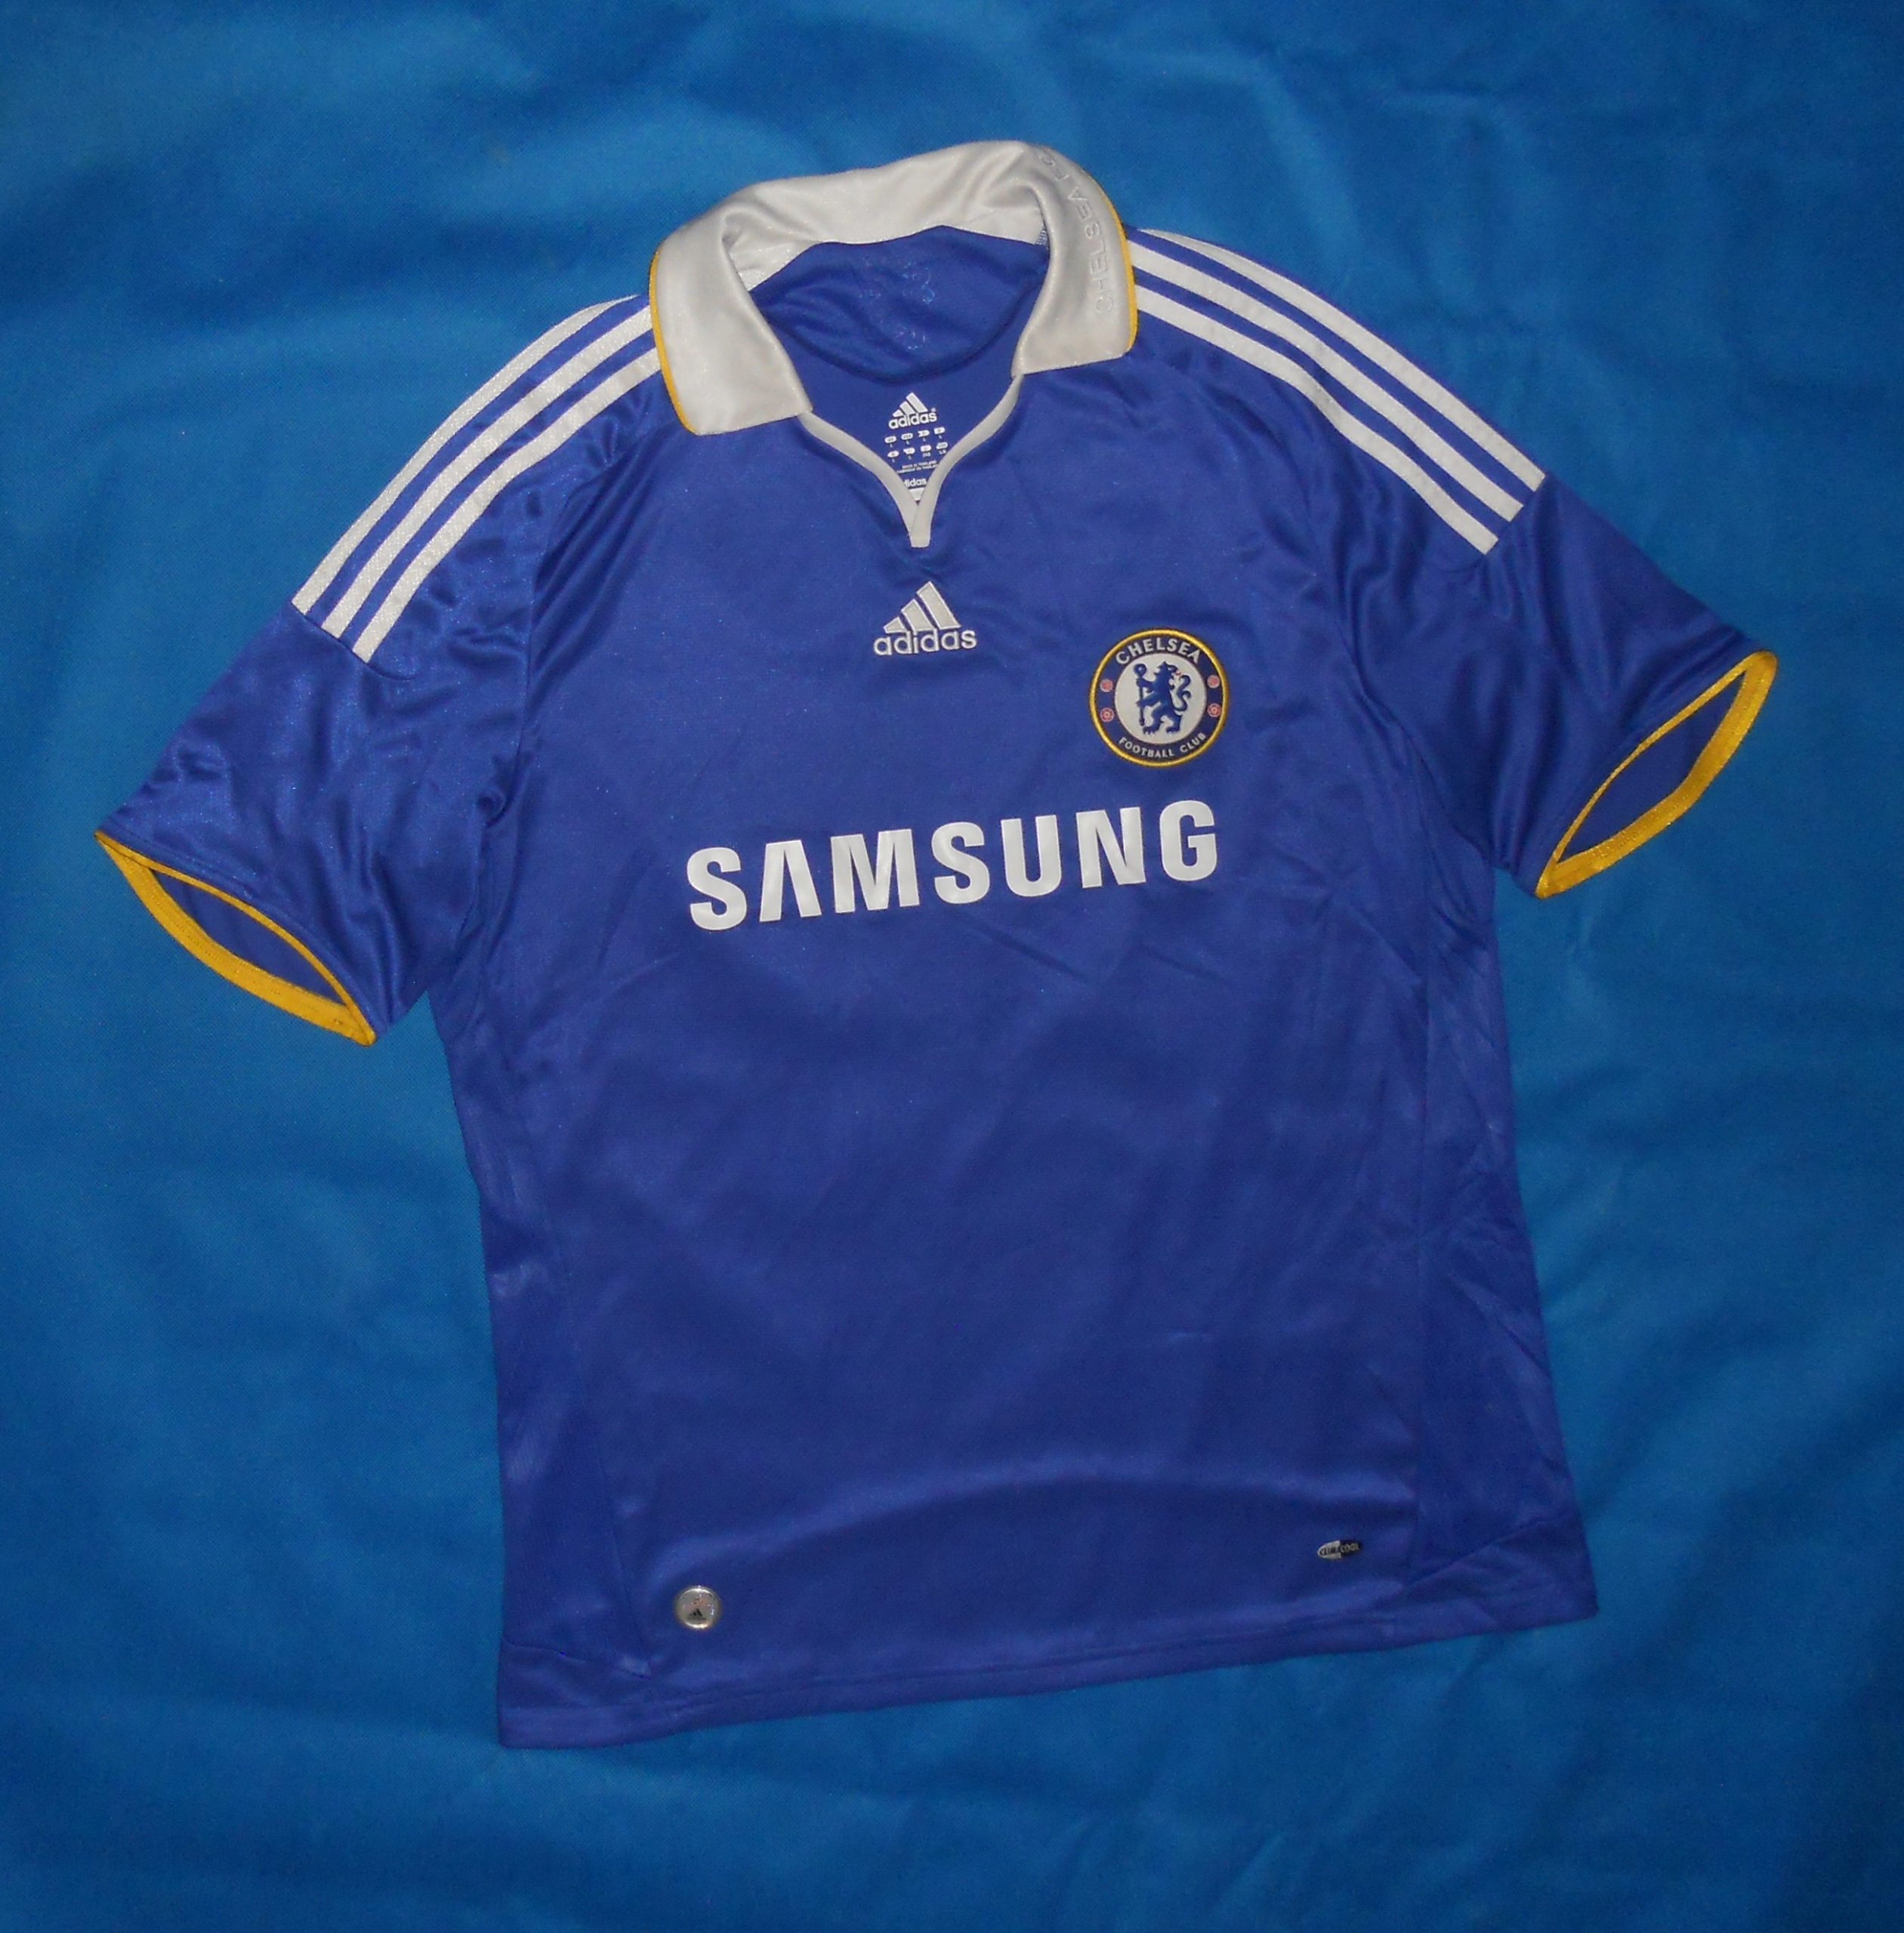 huge discount 08d0e ac8ab Chelsea FC Adidas Home Shirt 2008/09 Unikat L